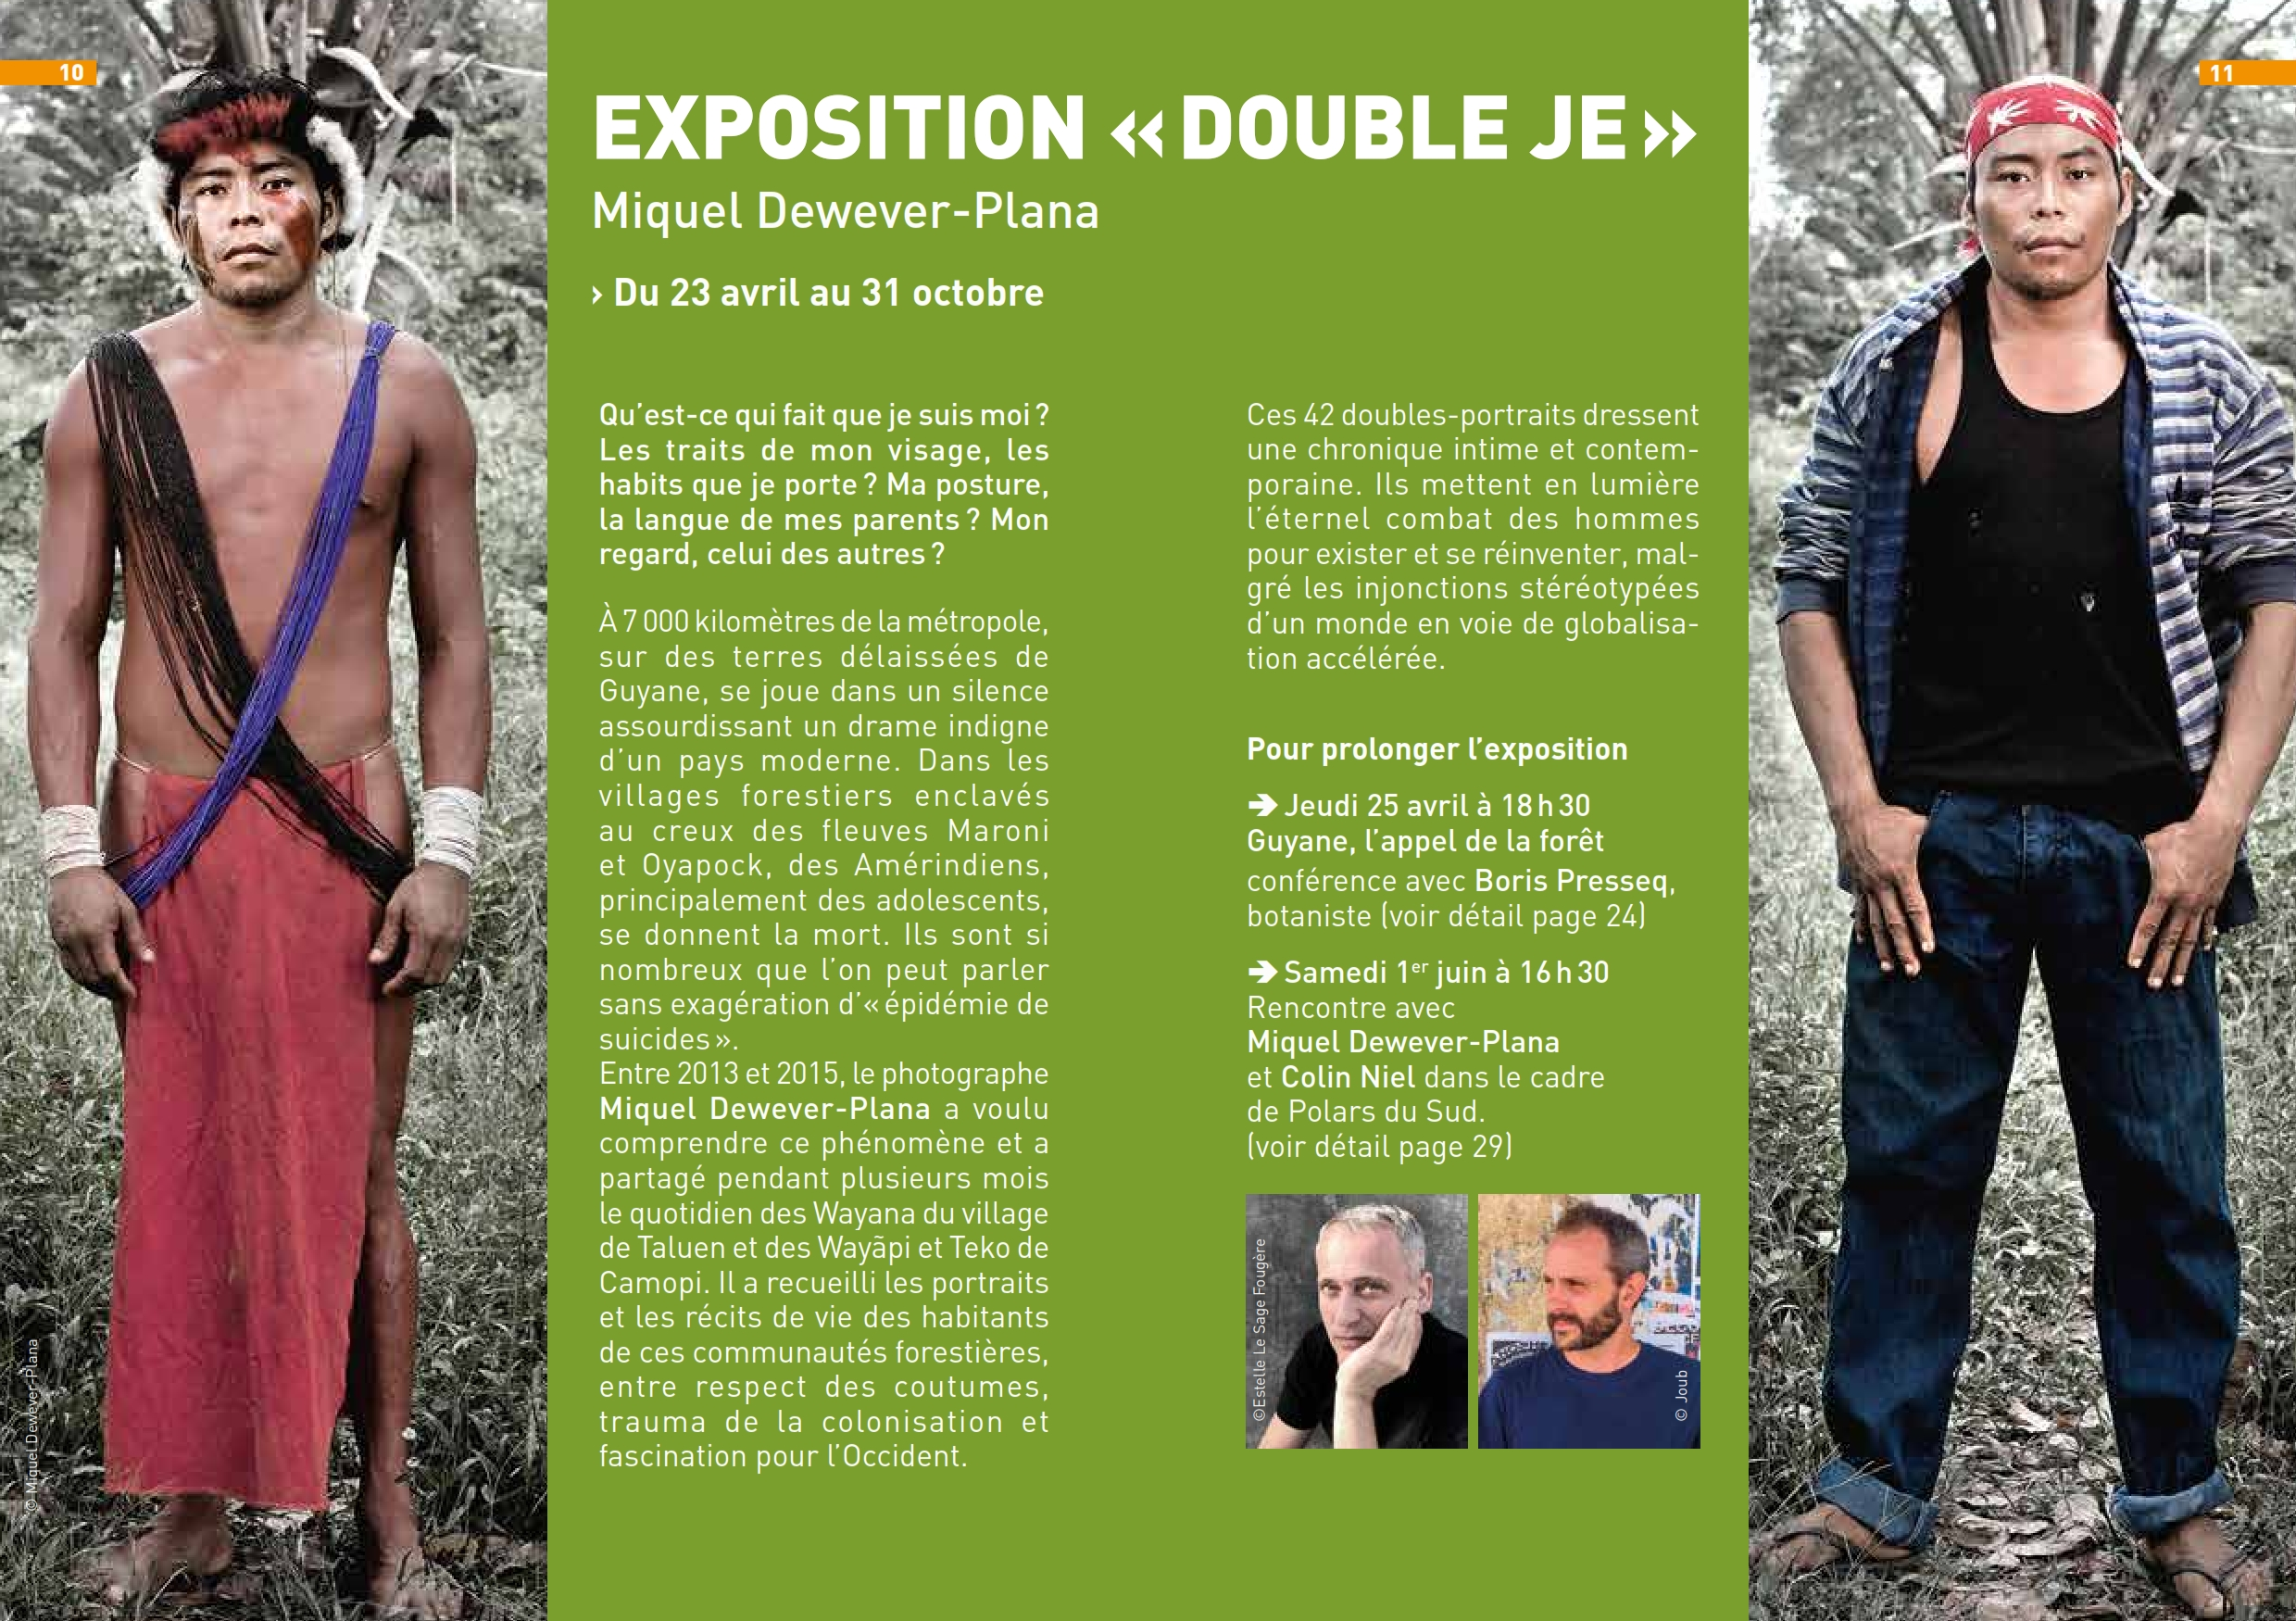 Exposition Double Je au jardin Muséum de Toulouse